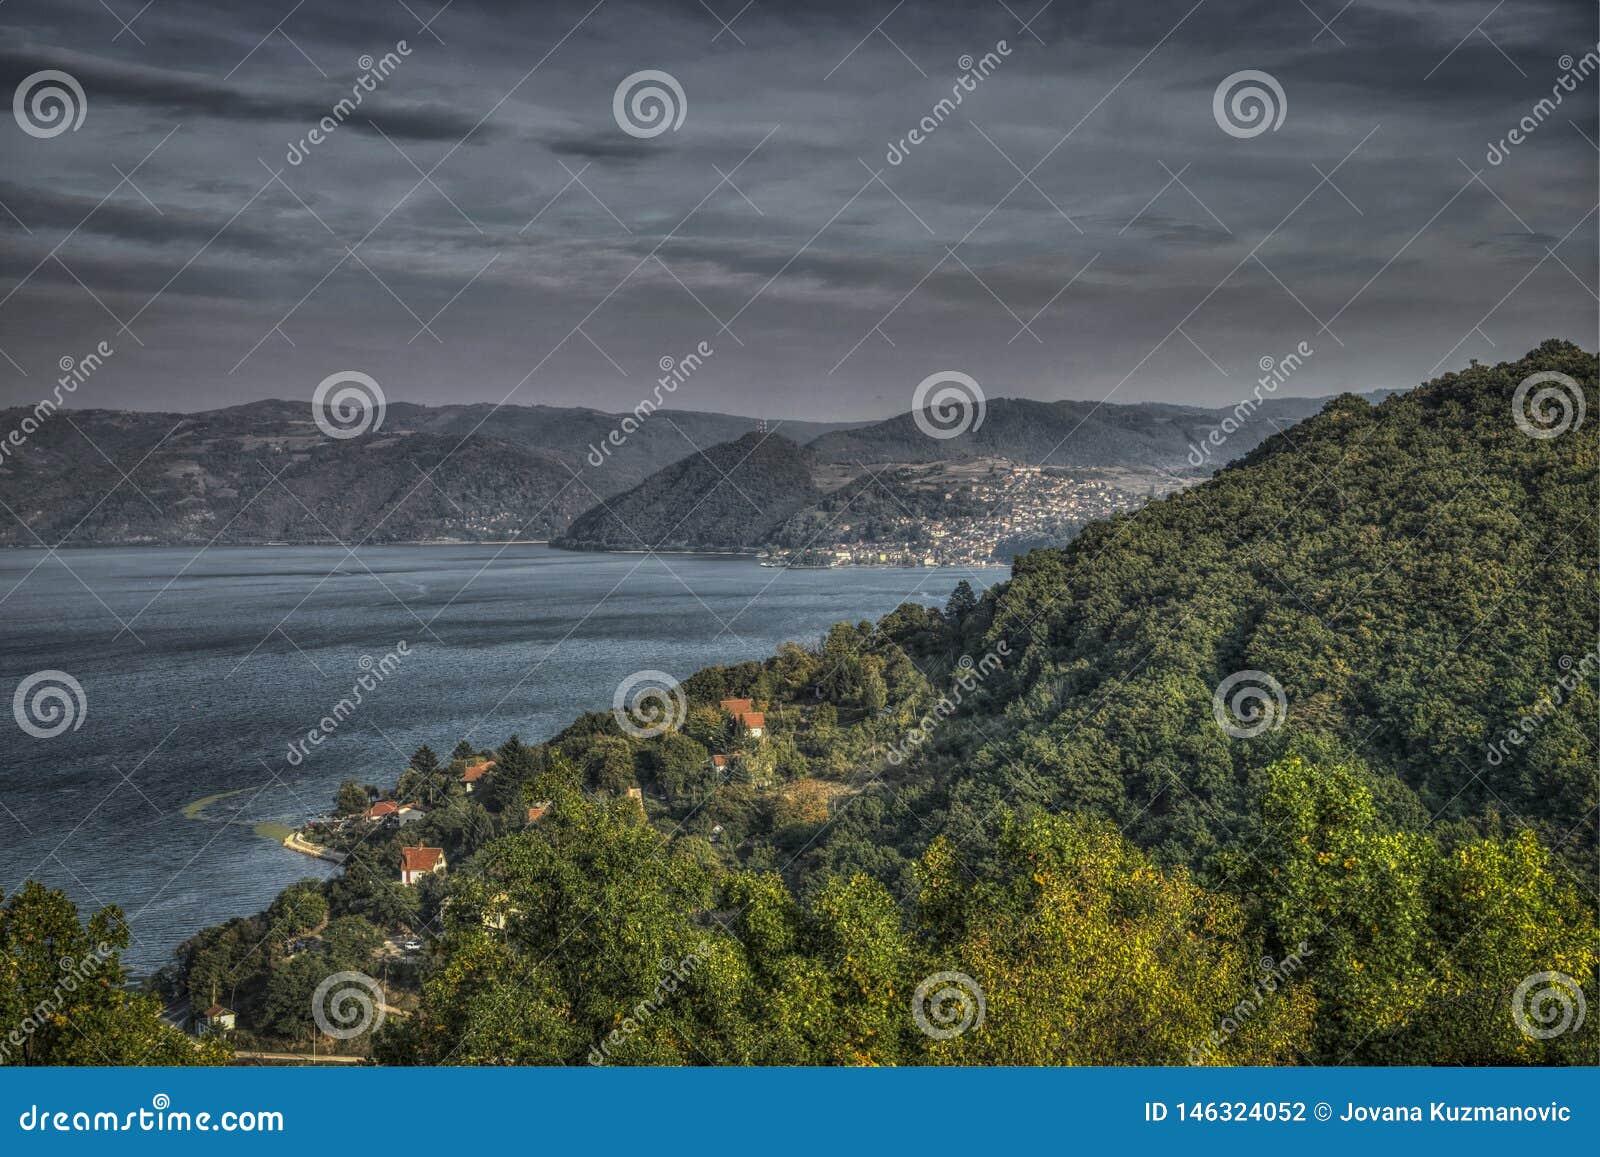 Panoramic view of Danube and Donji Milanovac